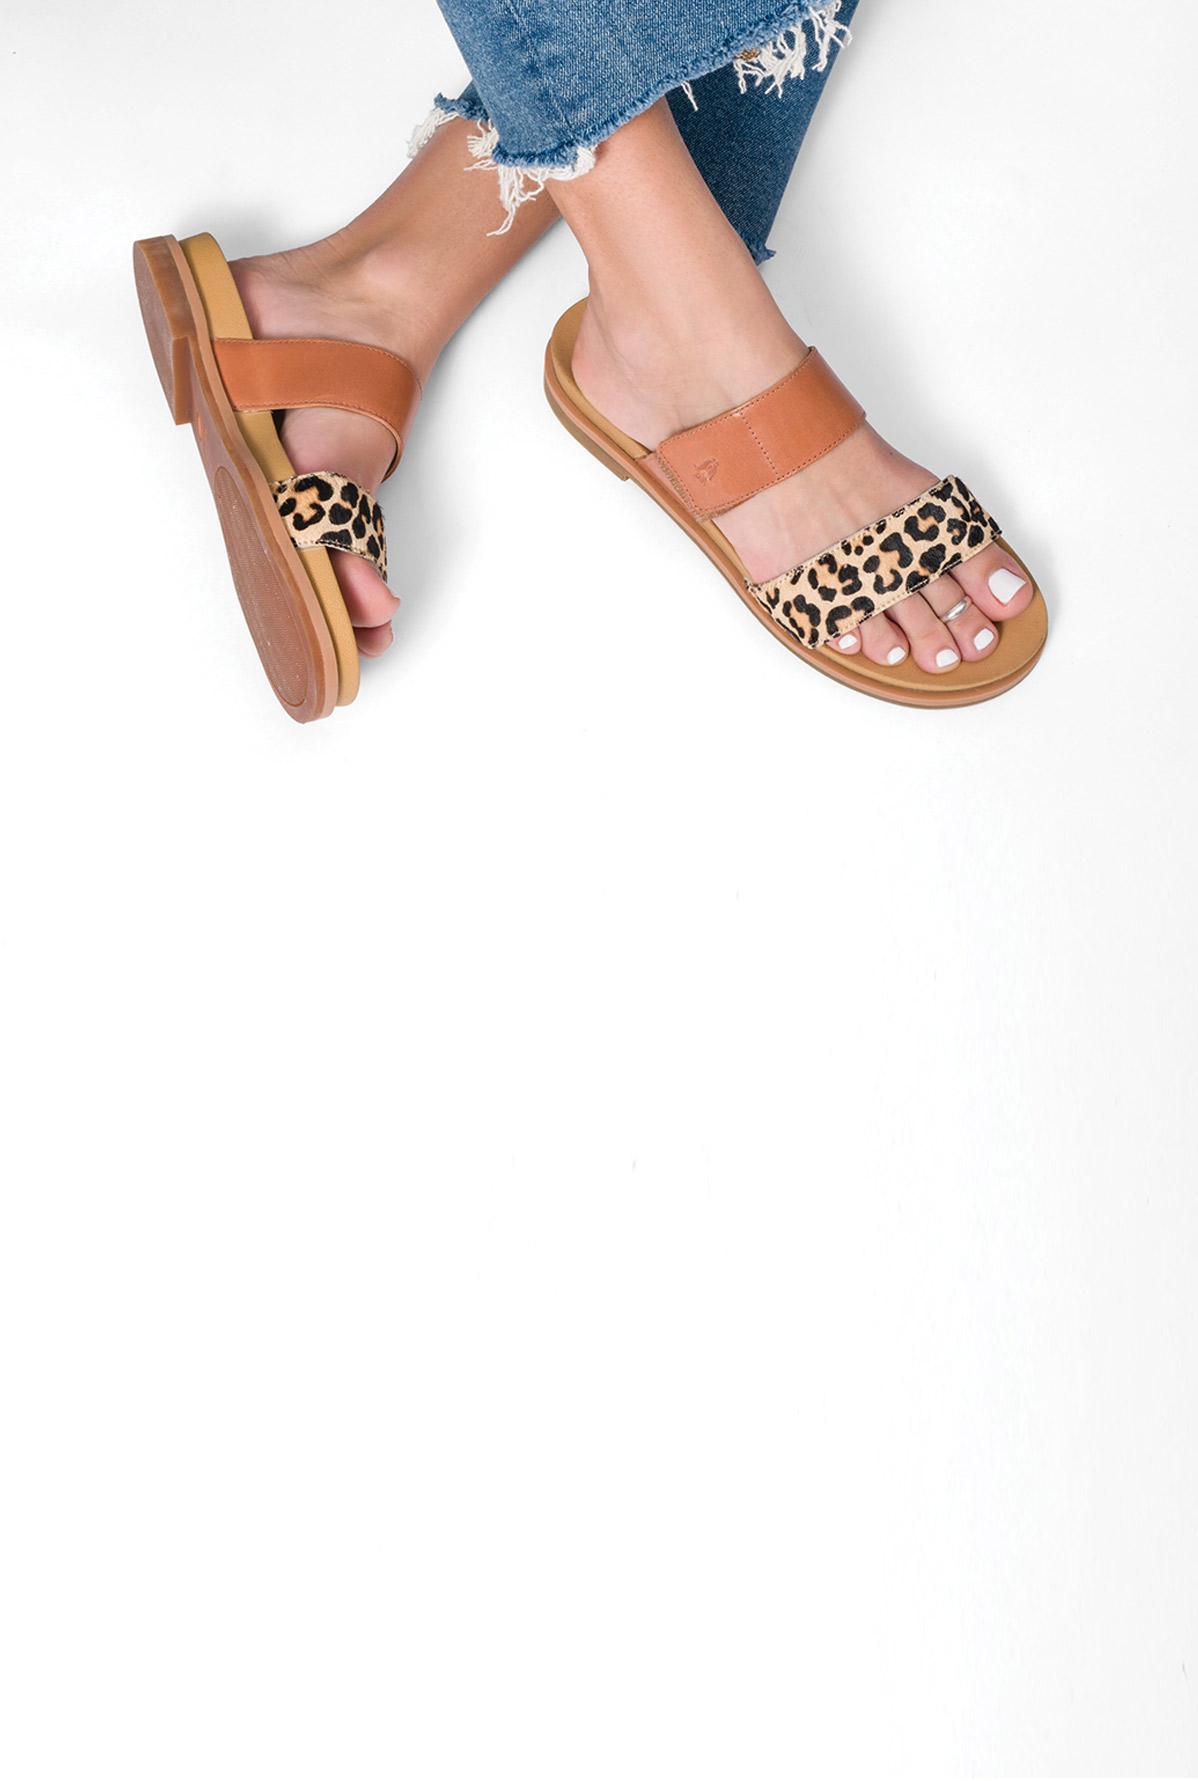 summer leopard print sandals.